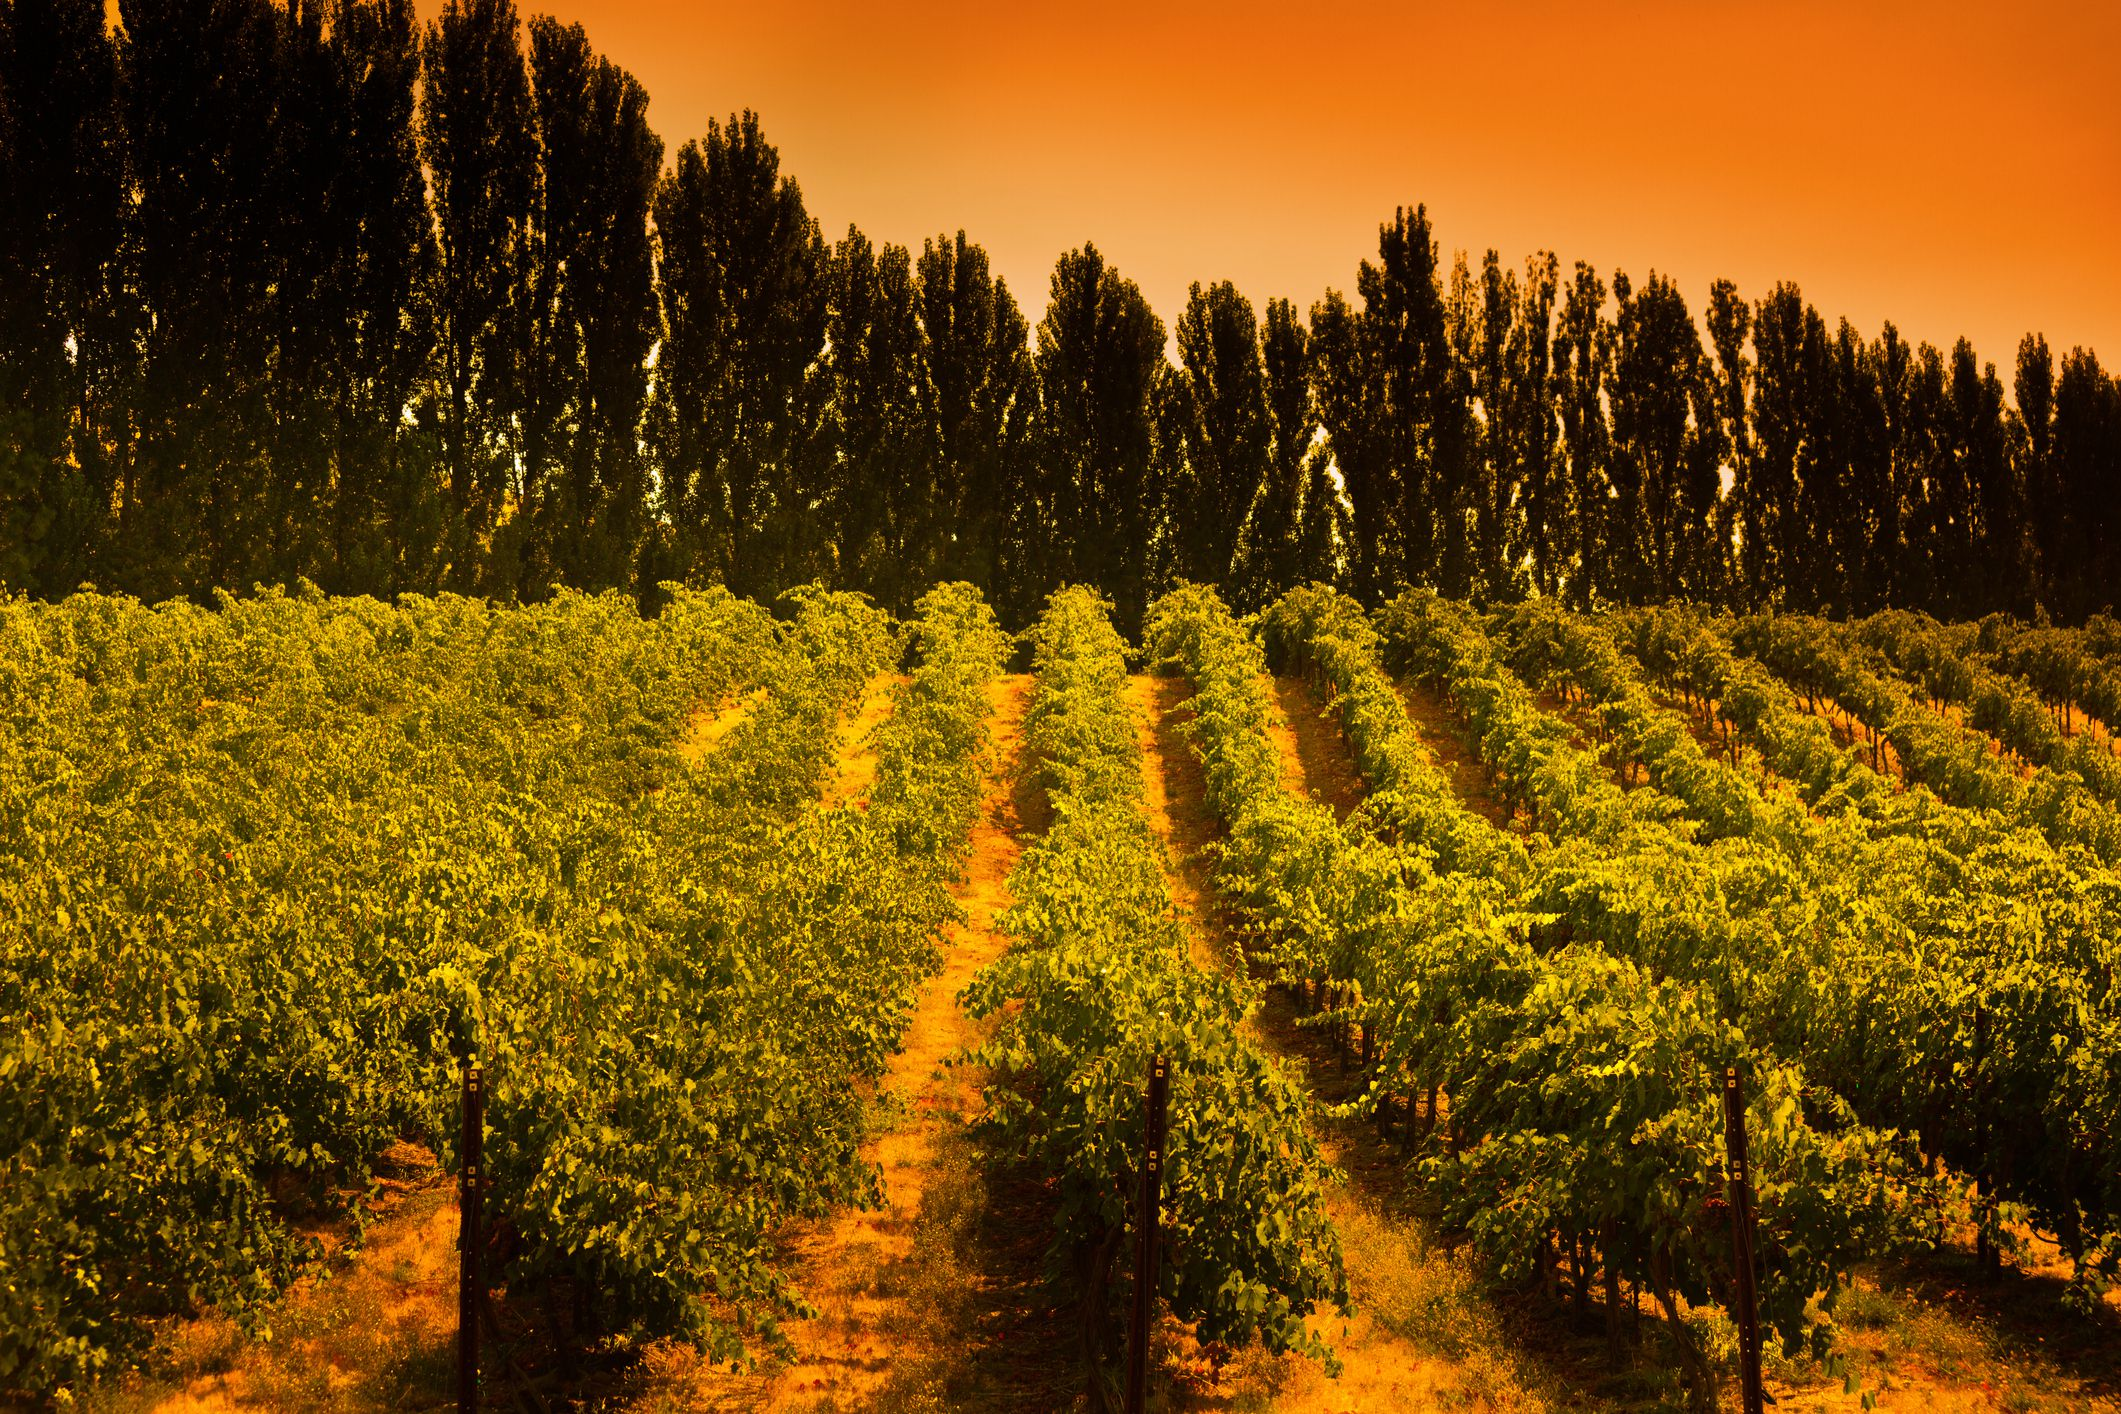 Washington State Columbia Valley Vineyard at Sunrise